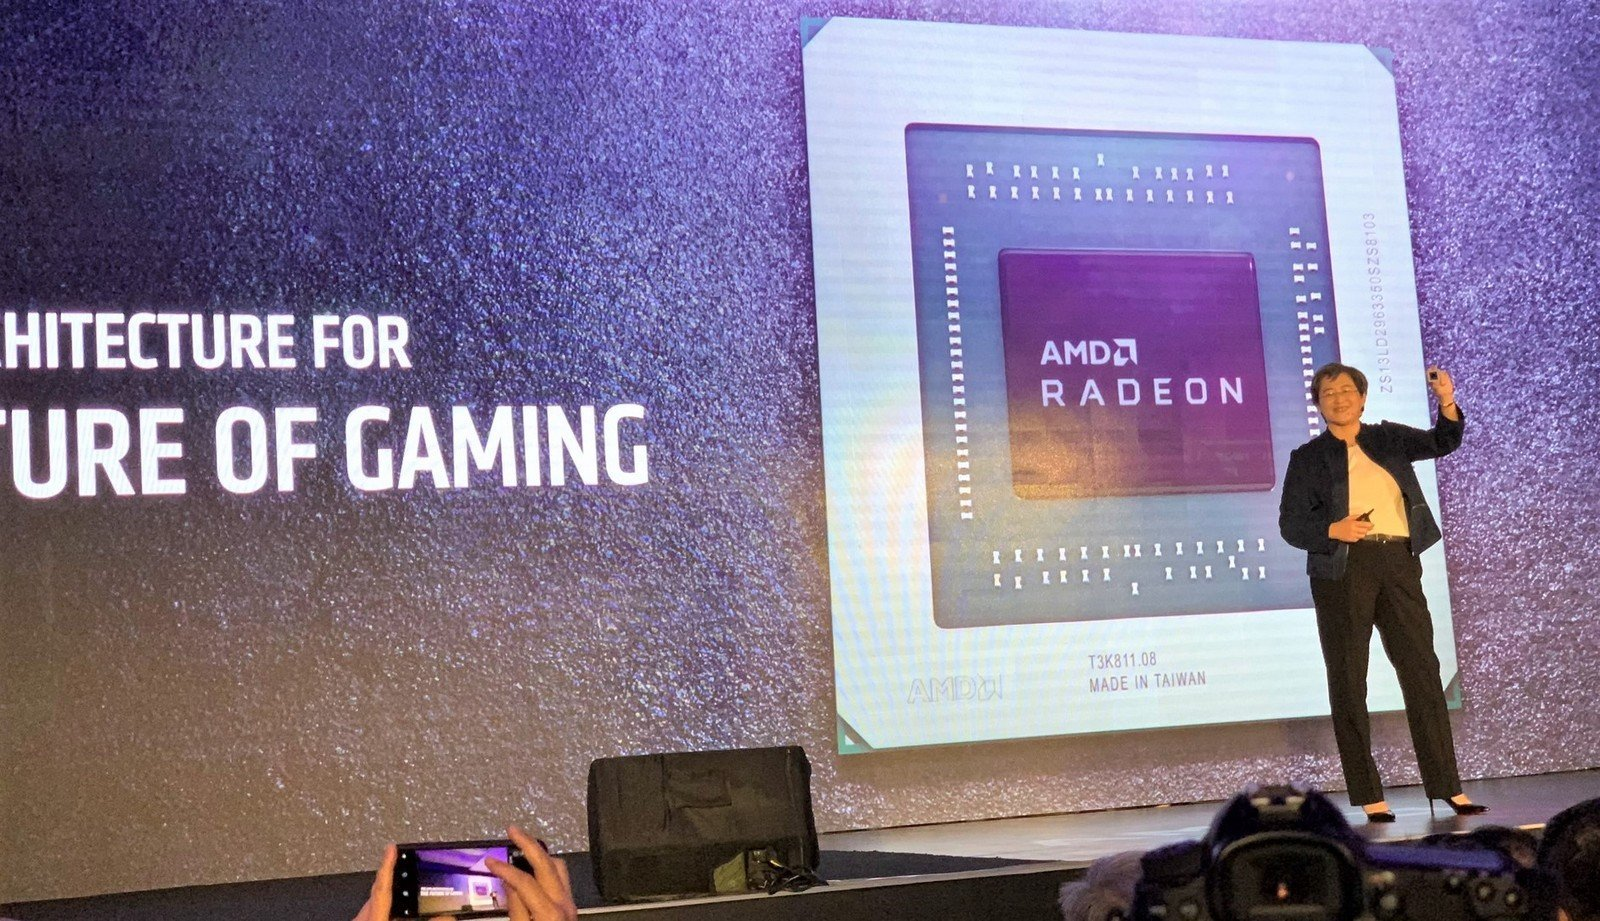 AMD Radeon Navi RX 5700